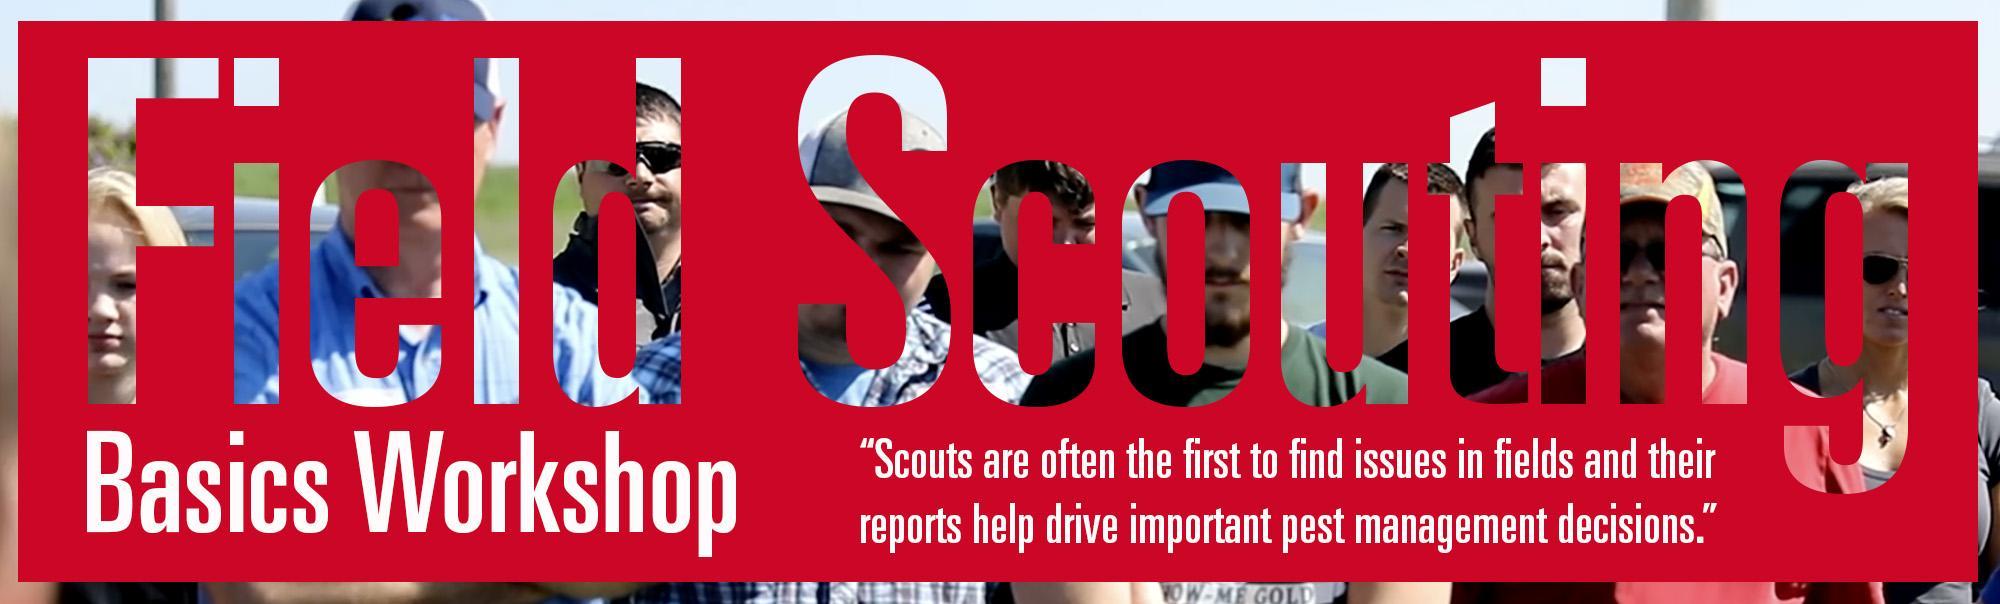 Field Scouting Basics Workshop